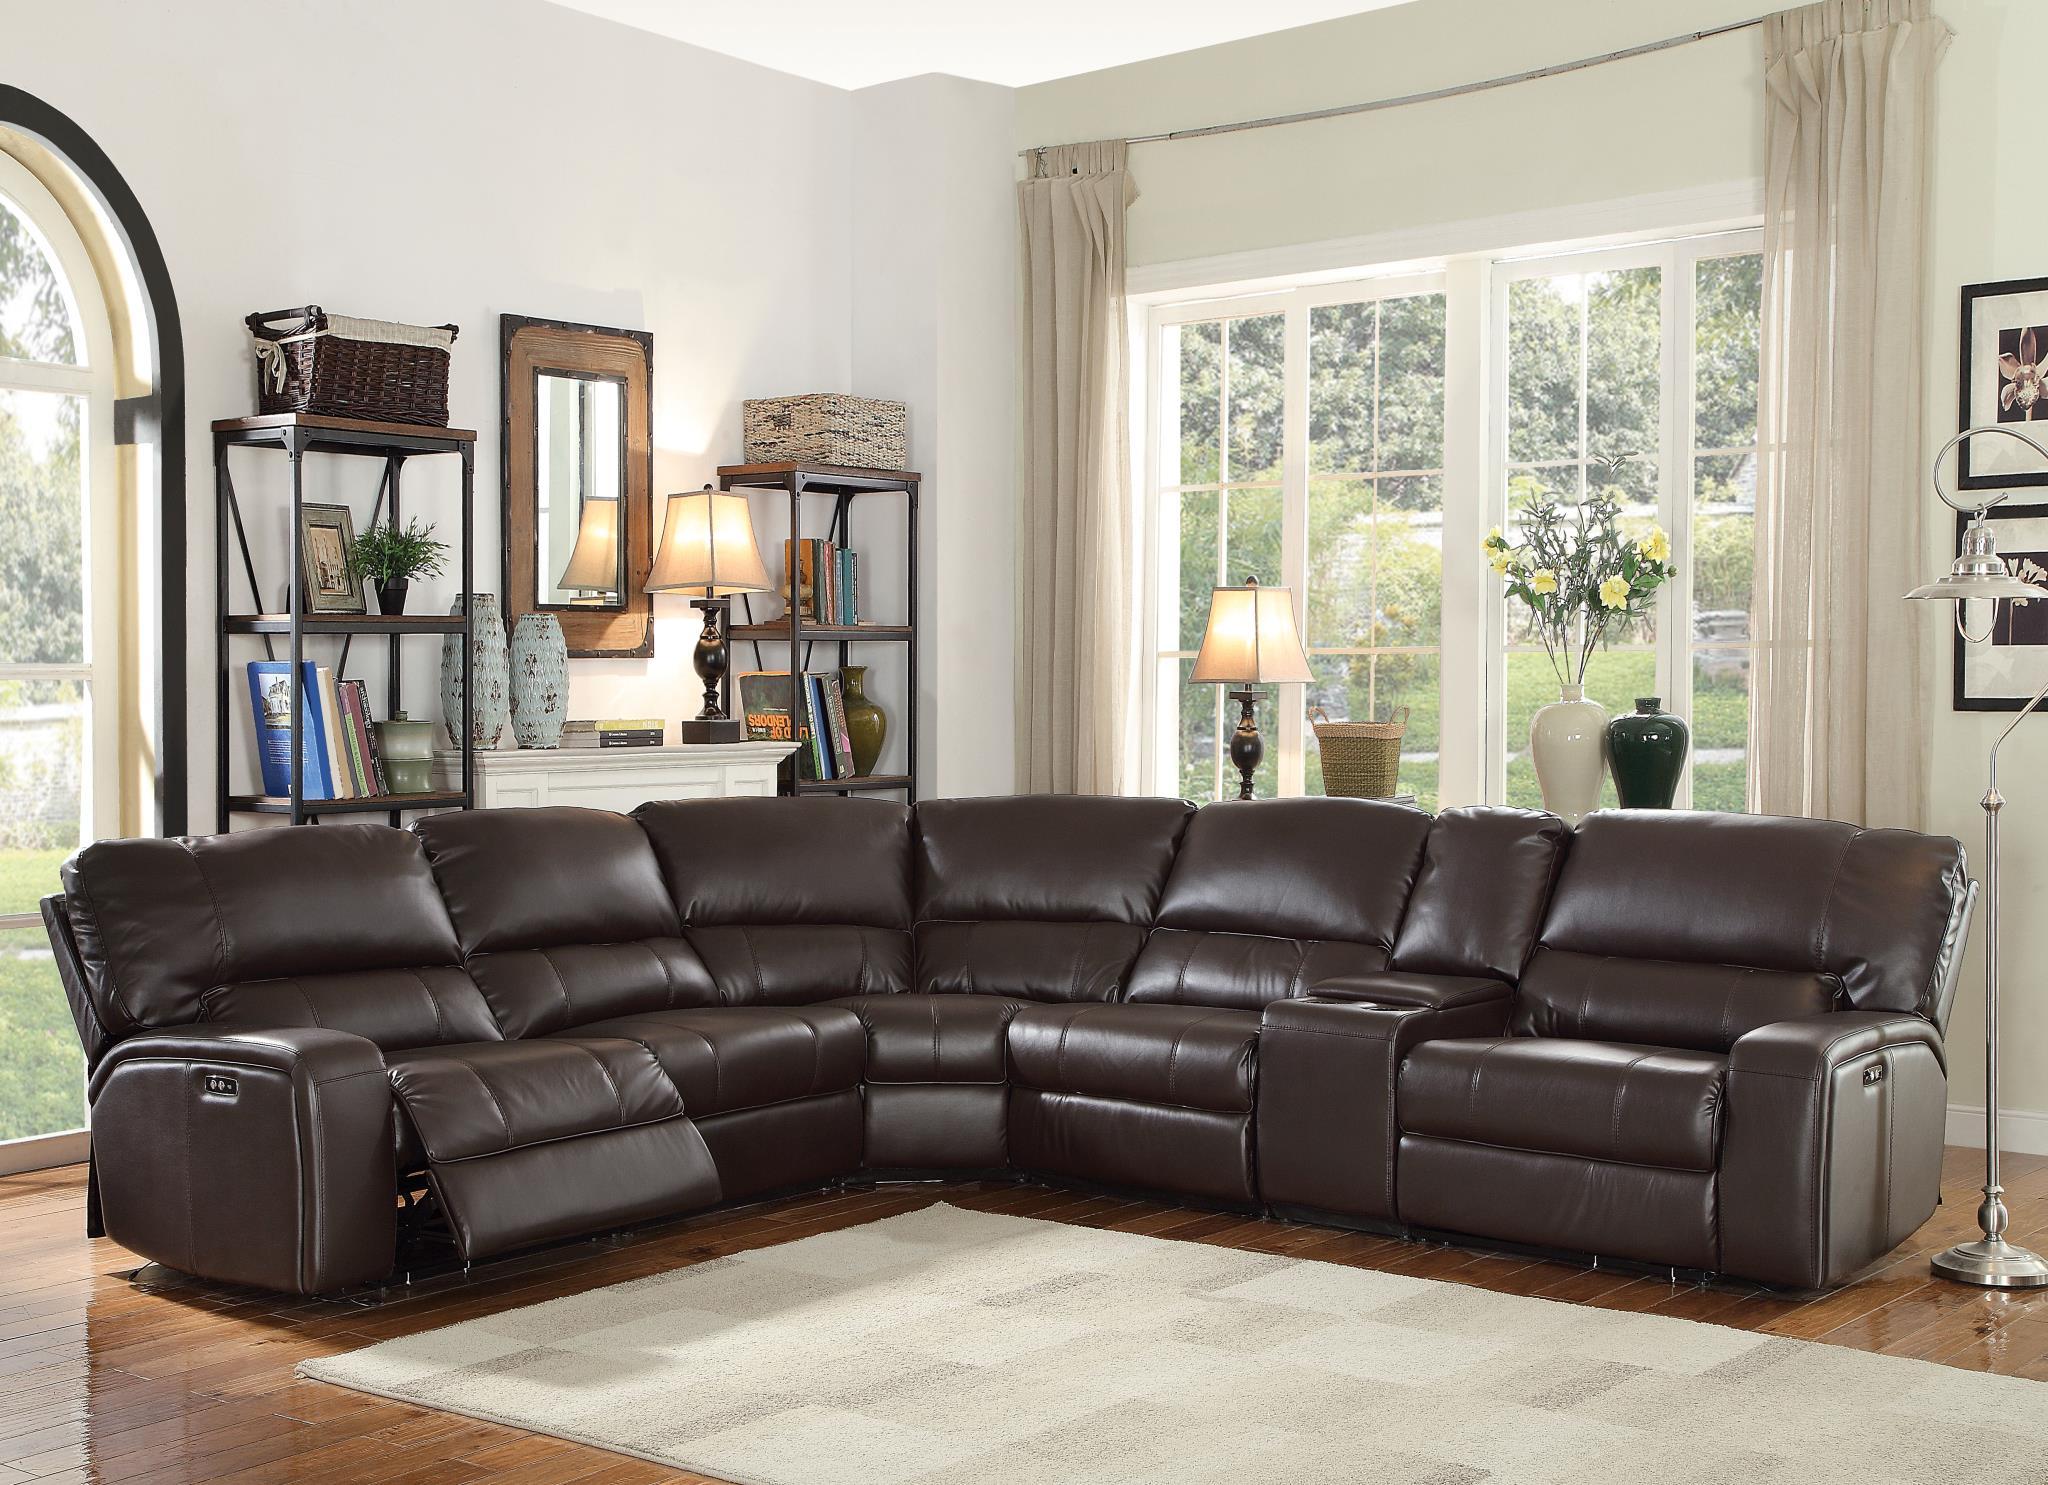 Espresso Complete Sectional Sofa